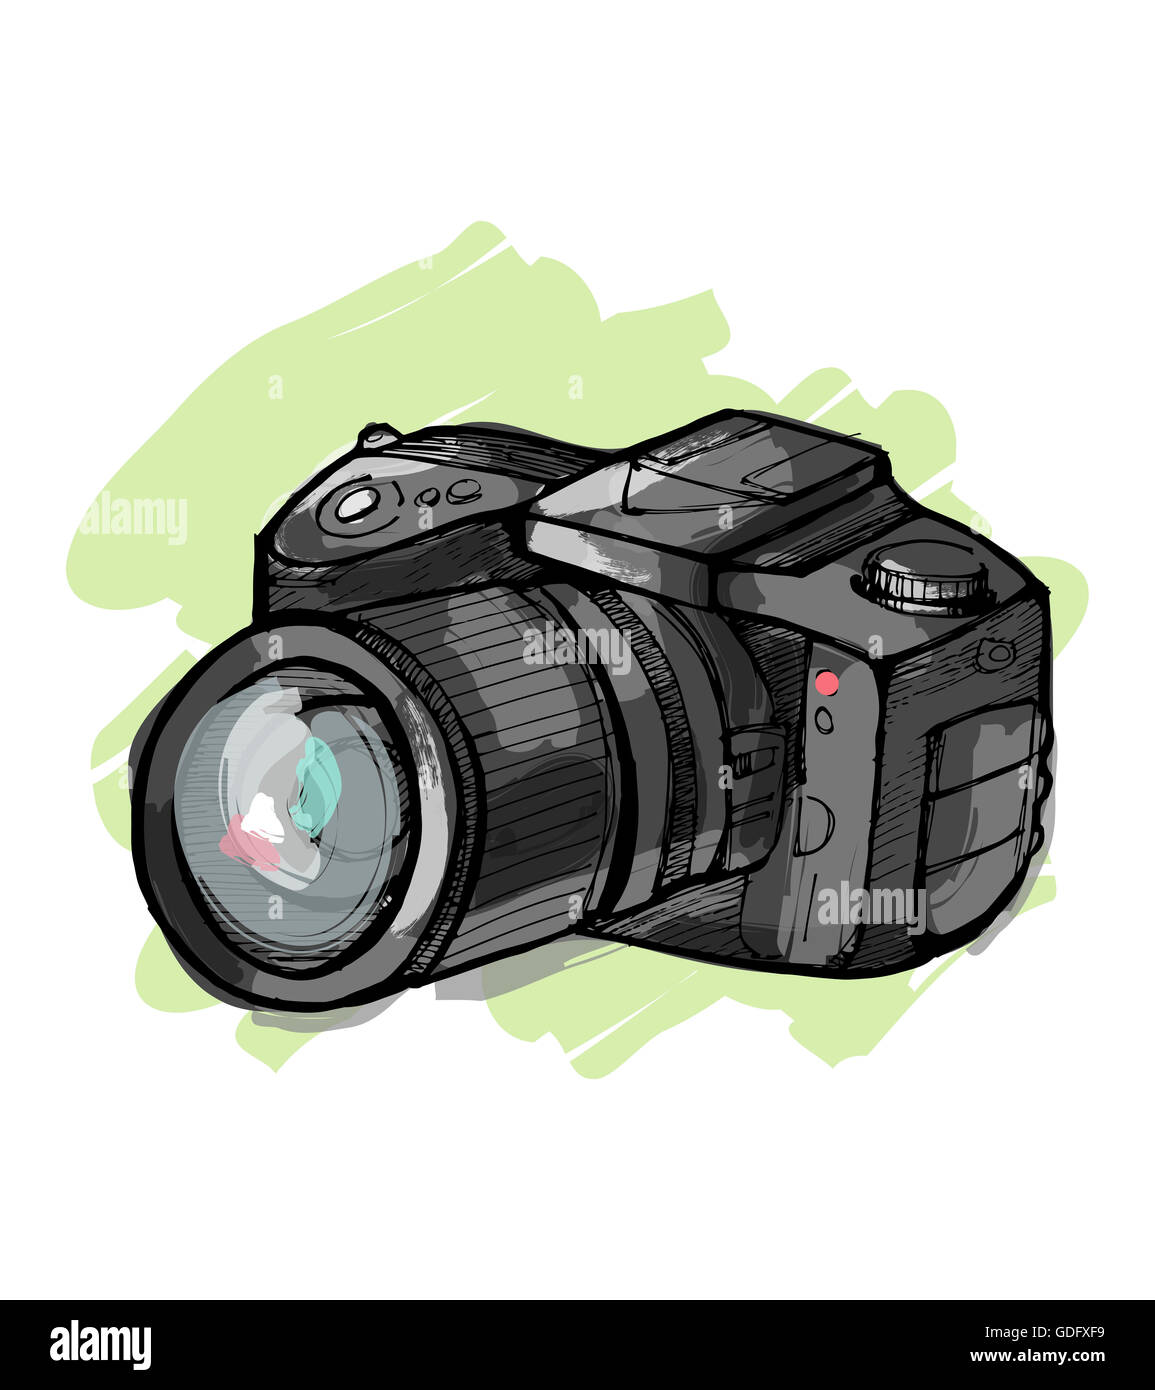 Dessin Appareil Photo hand drawn vector illustration ou dessin d'un appareil photo reflex